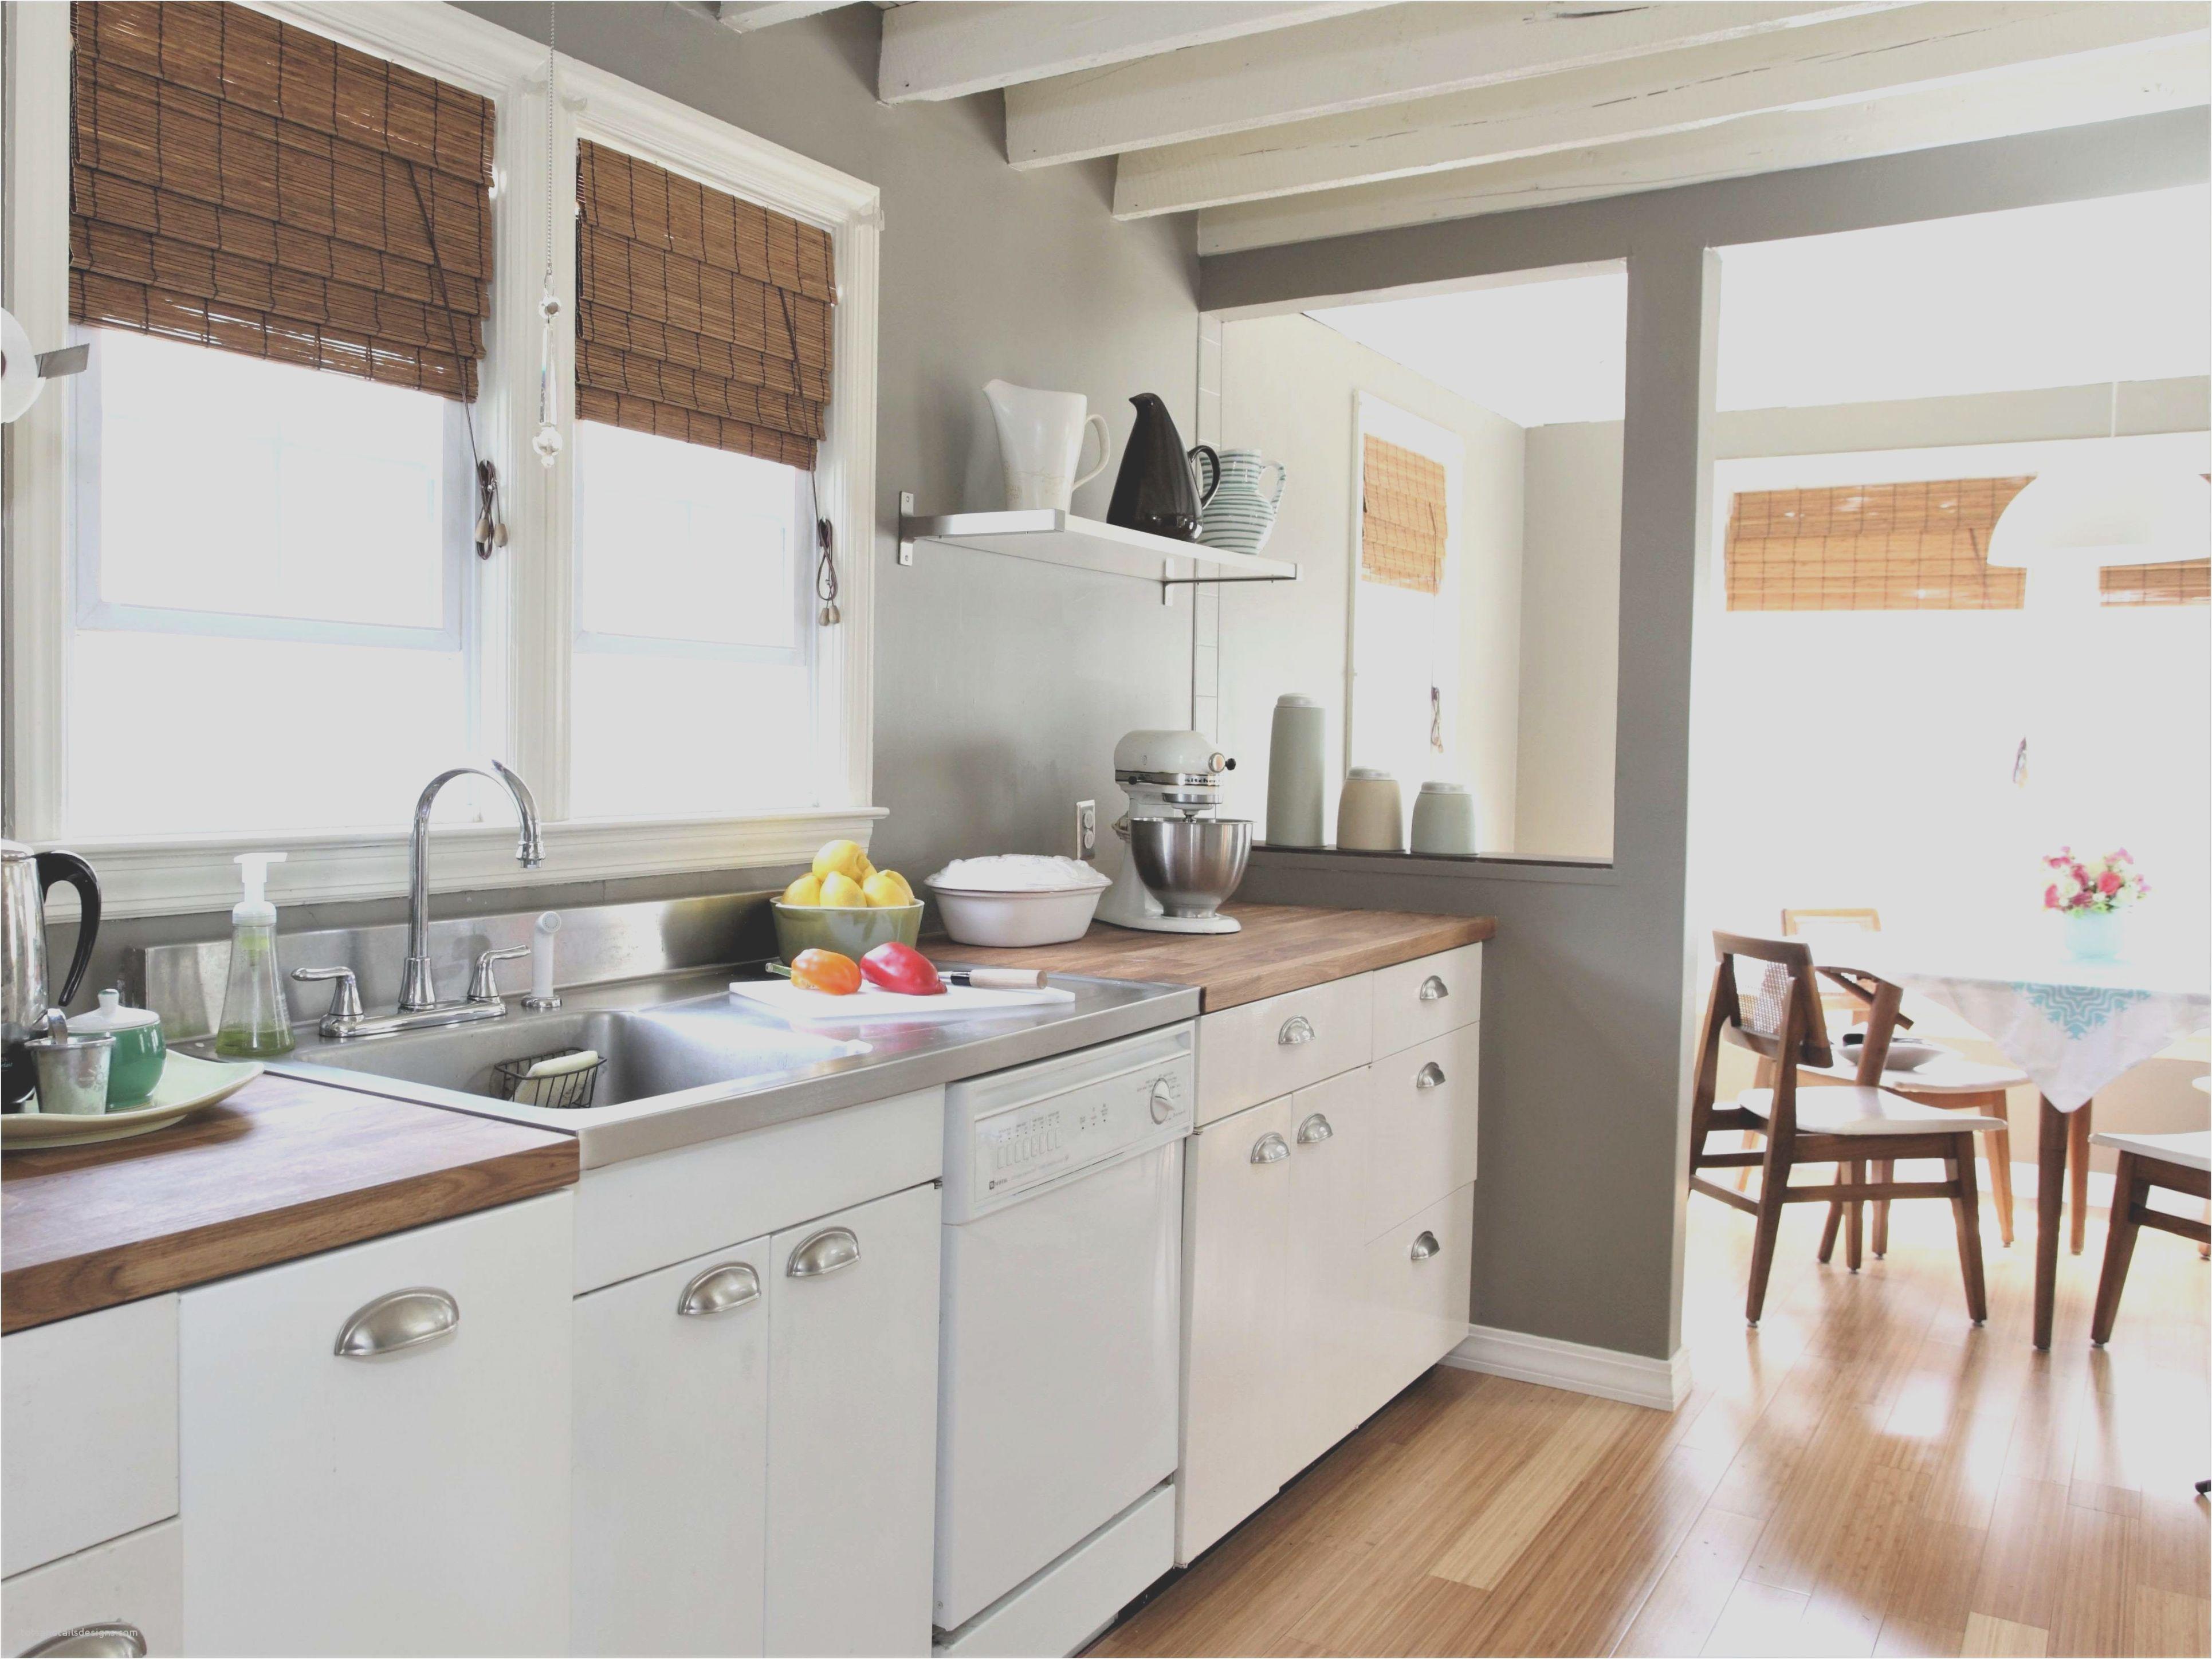 50 Pretty Refacing Kitchen Cabinet Doors Decor Refacing